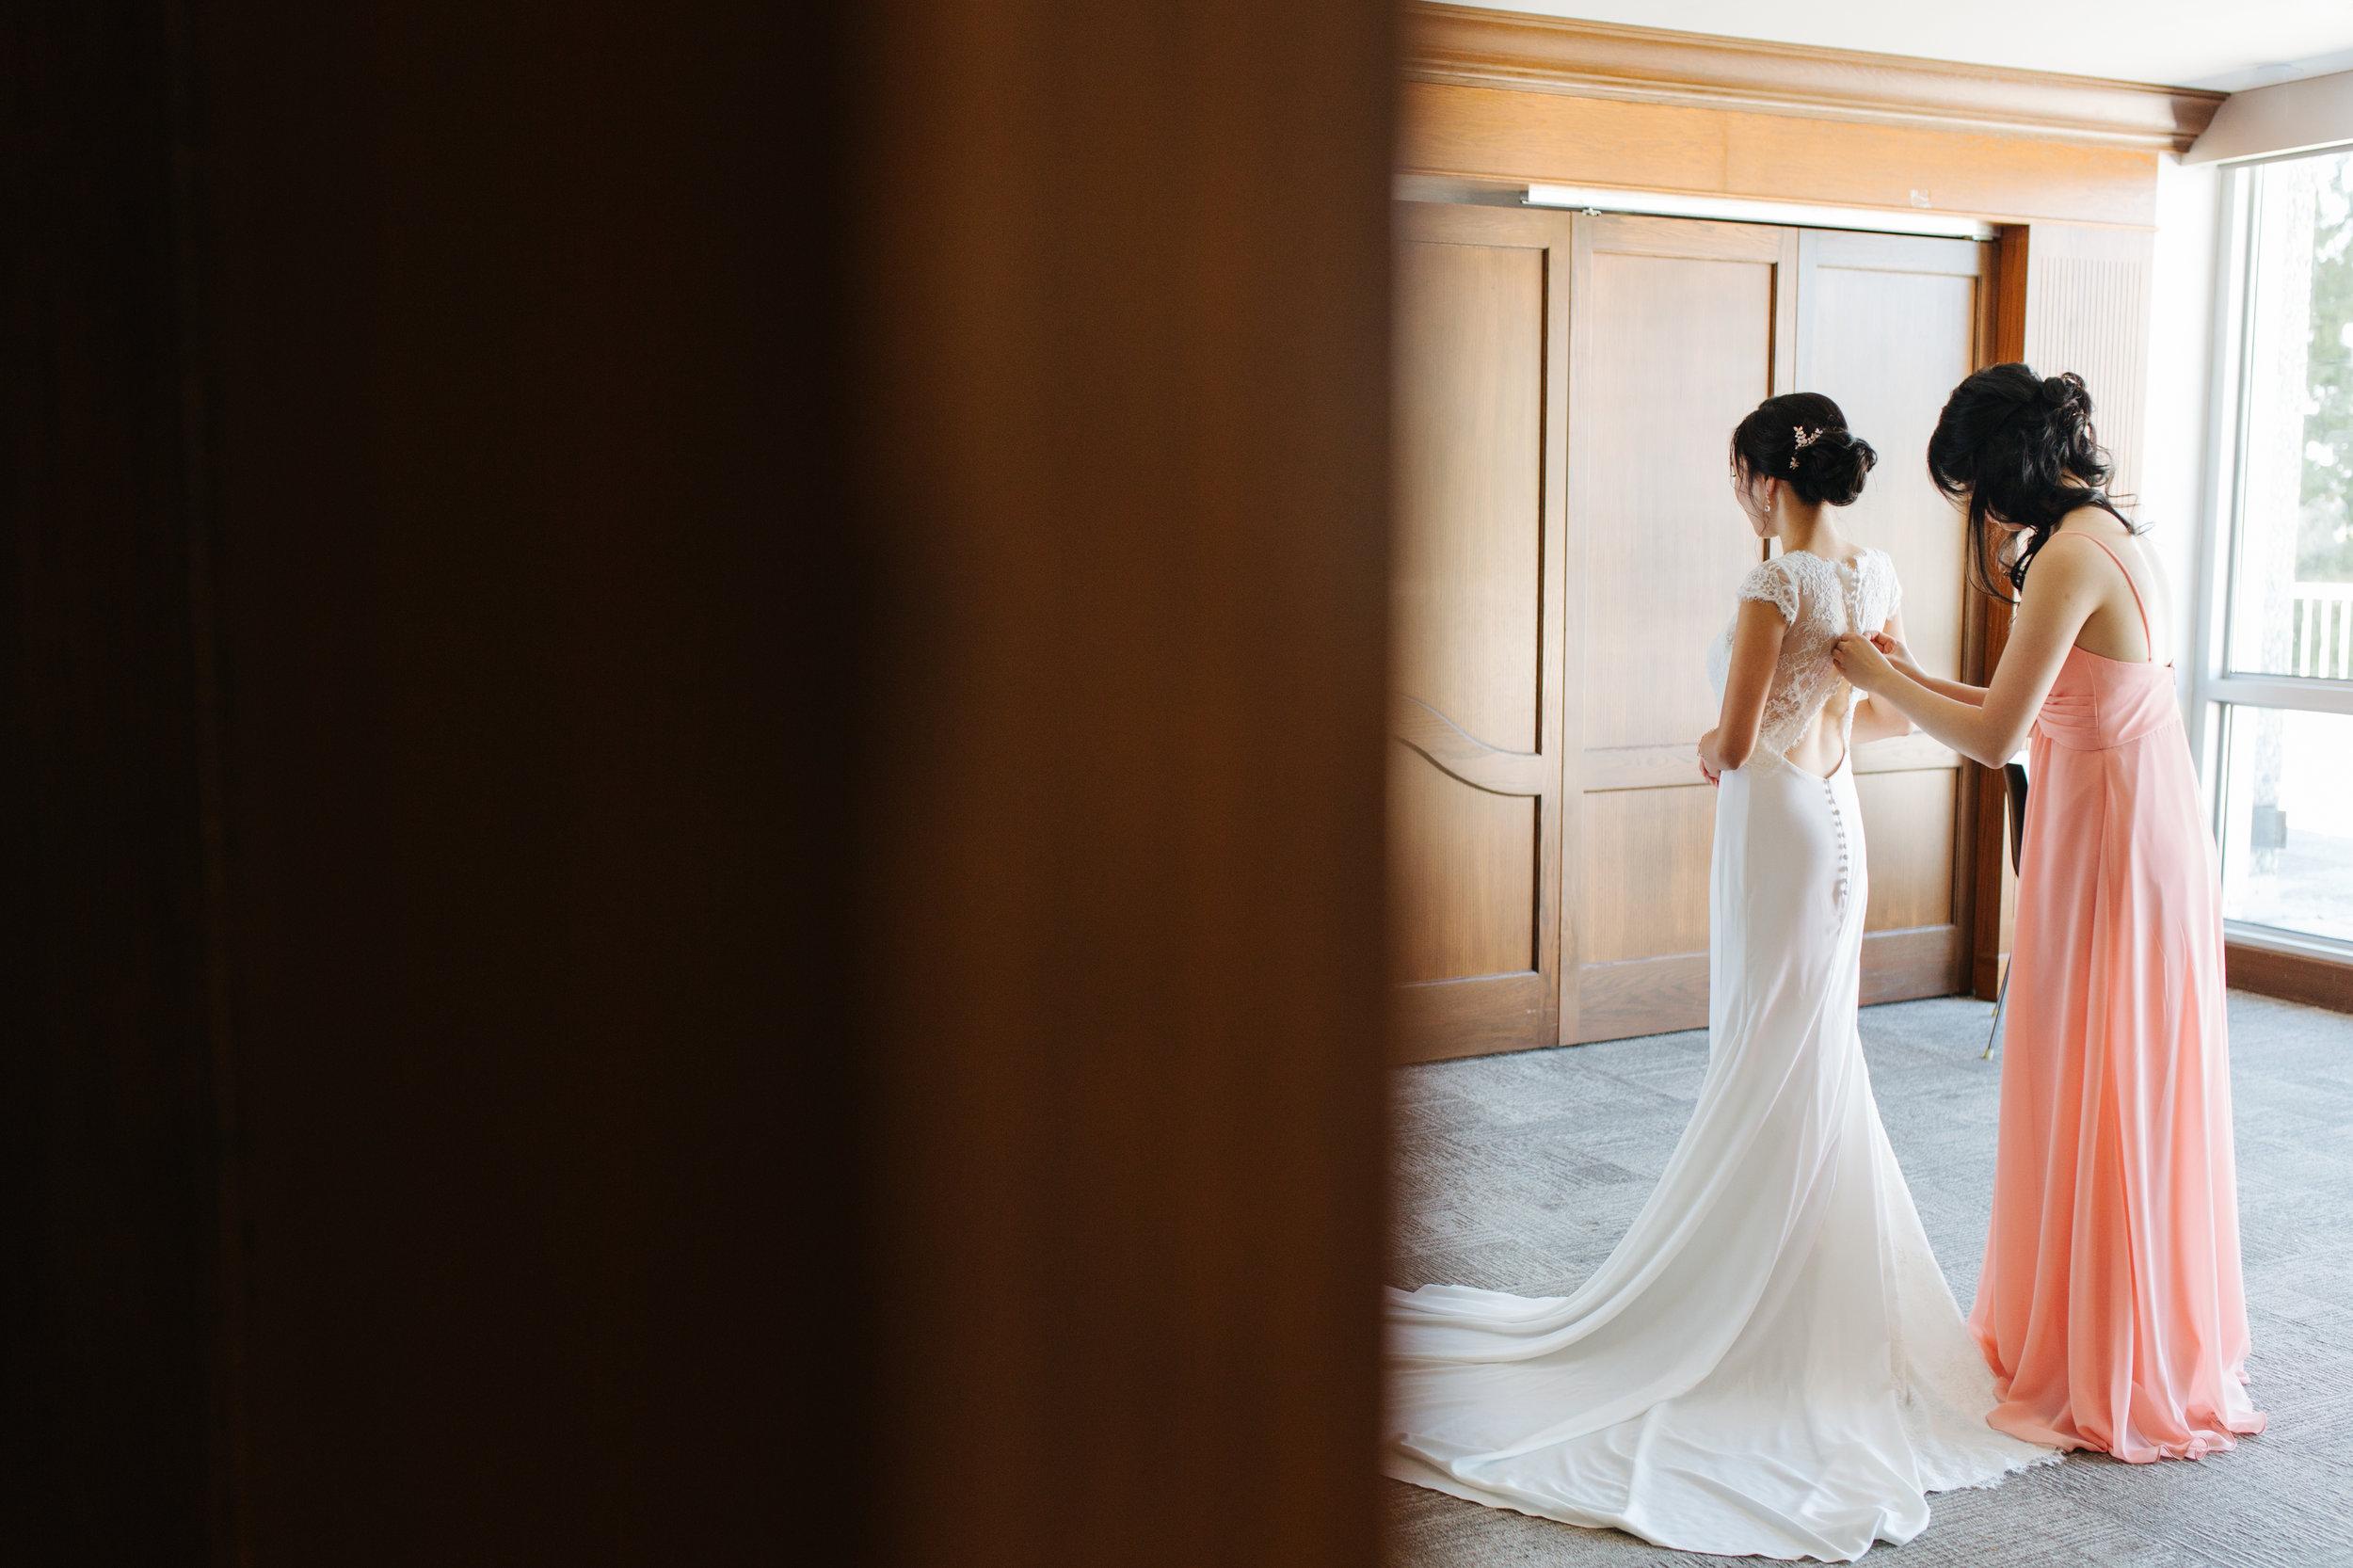 herastudios_wedding_julie_jason_hera_selects-42.jpg